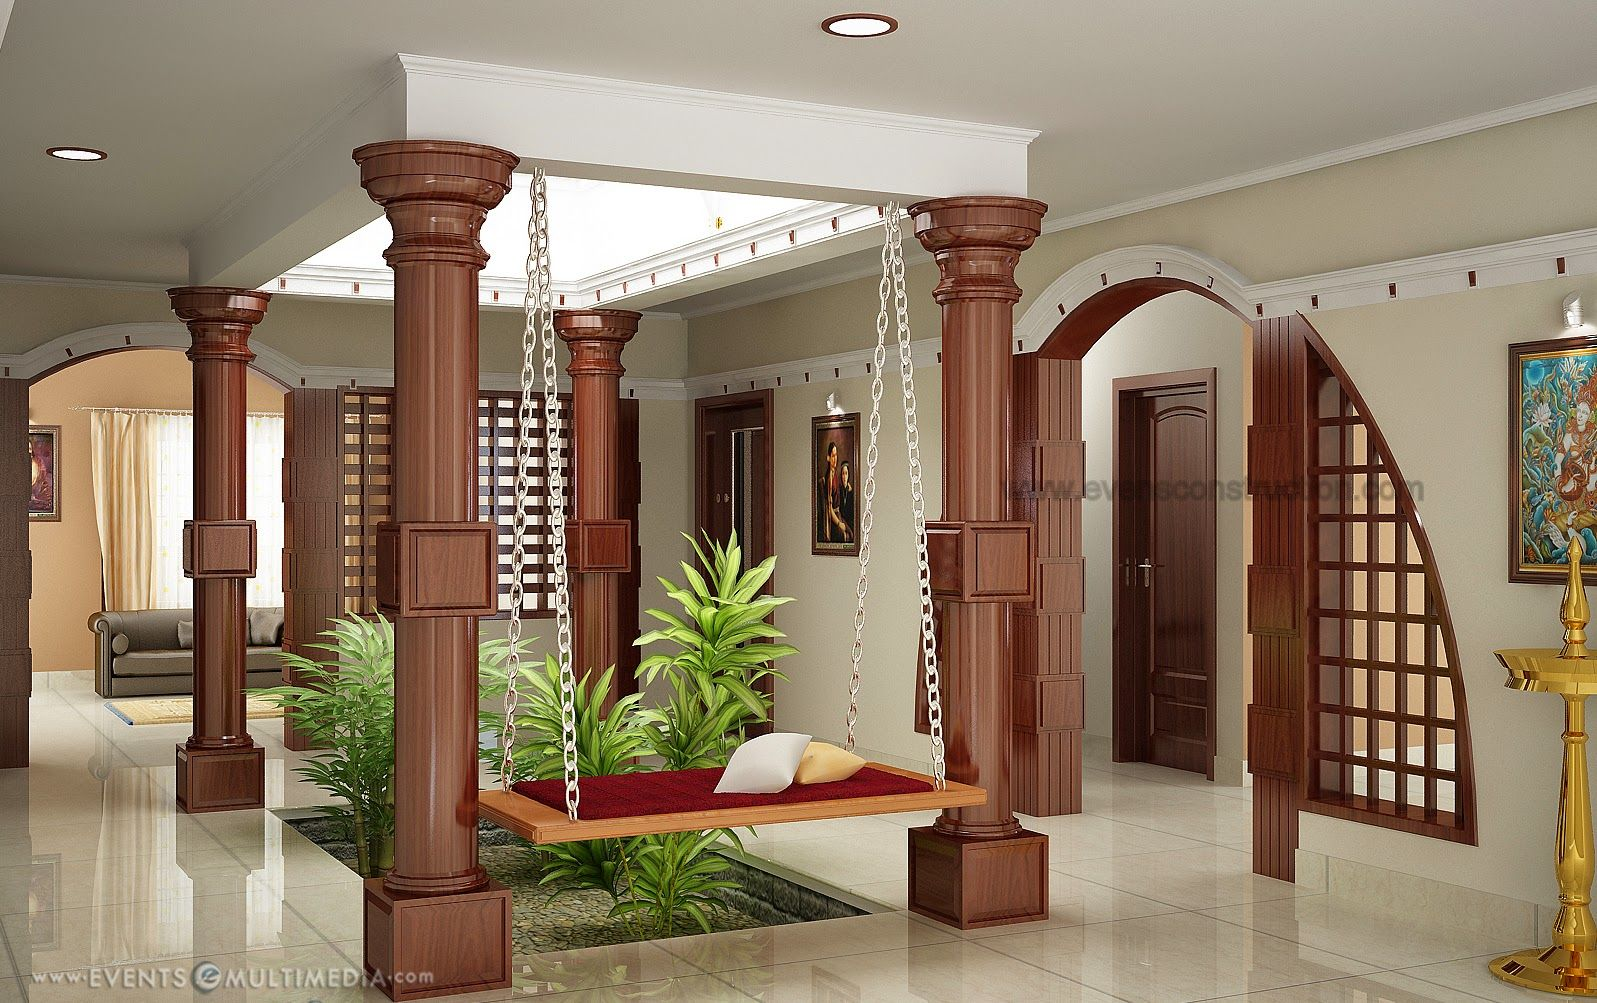 interior design kerala - Google Search   inside and ...